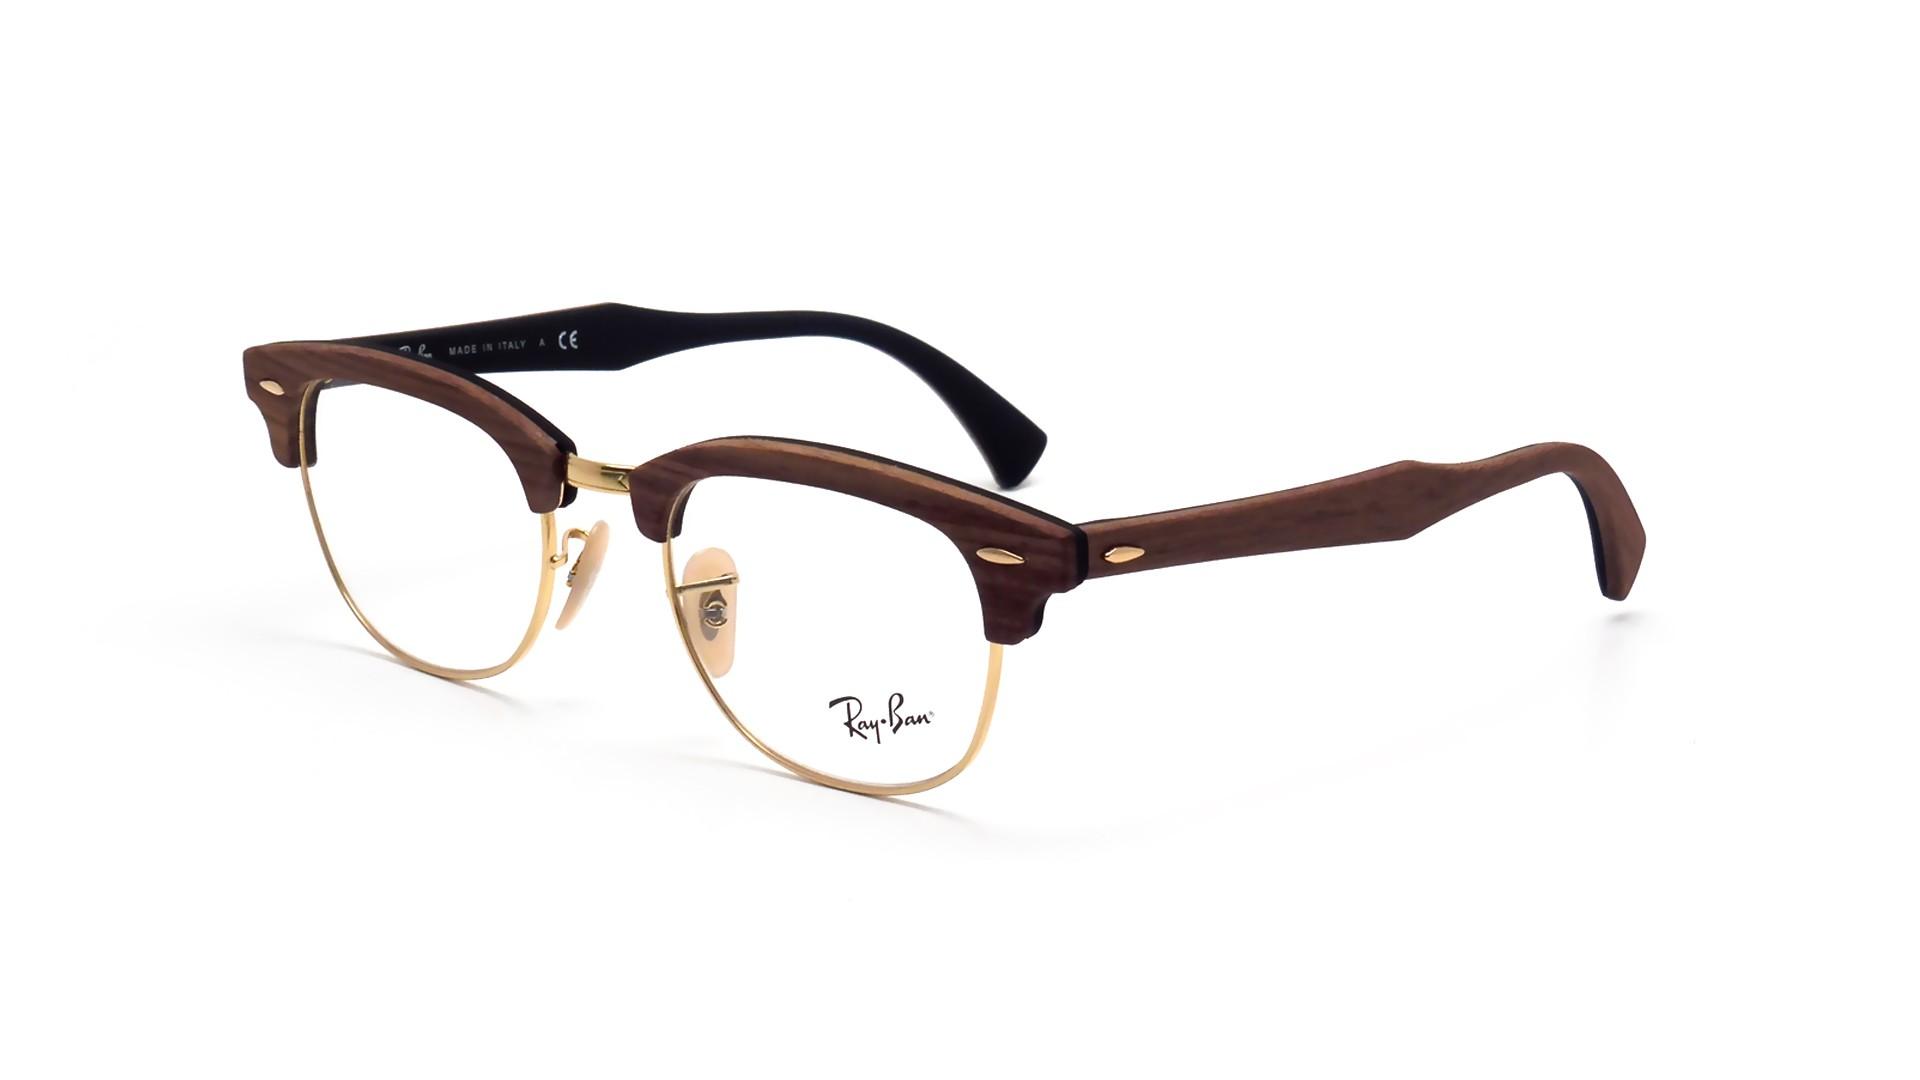 b4a46f8d5f872c ray ban de vue clubmaster,lunettes de vue ray ban rx 5154 ecaille 2372  clubmaster